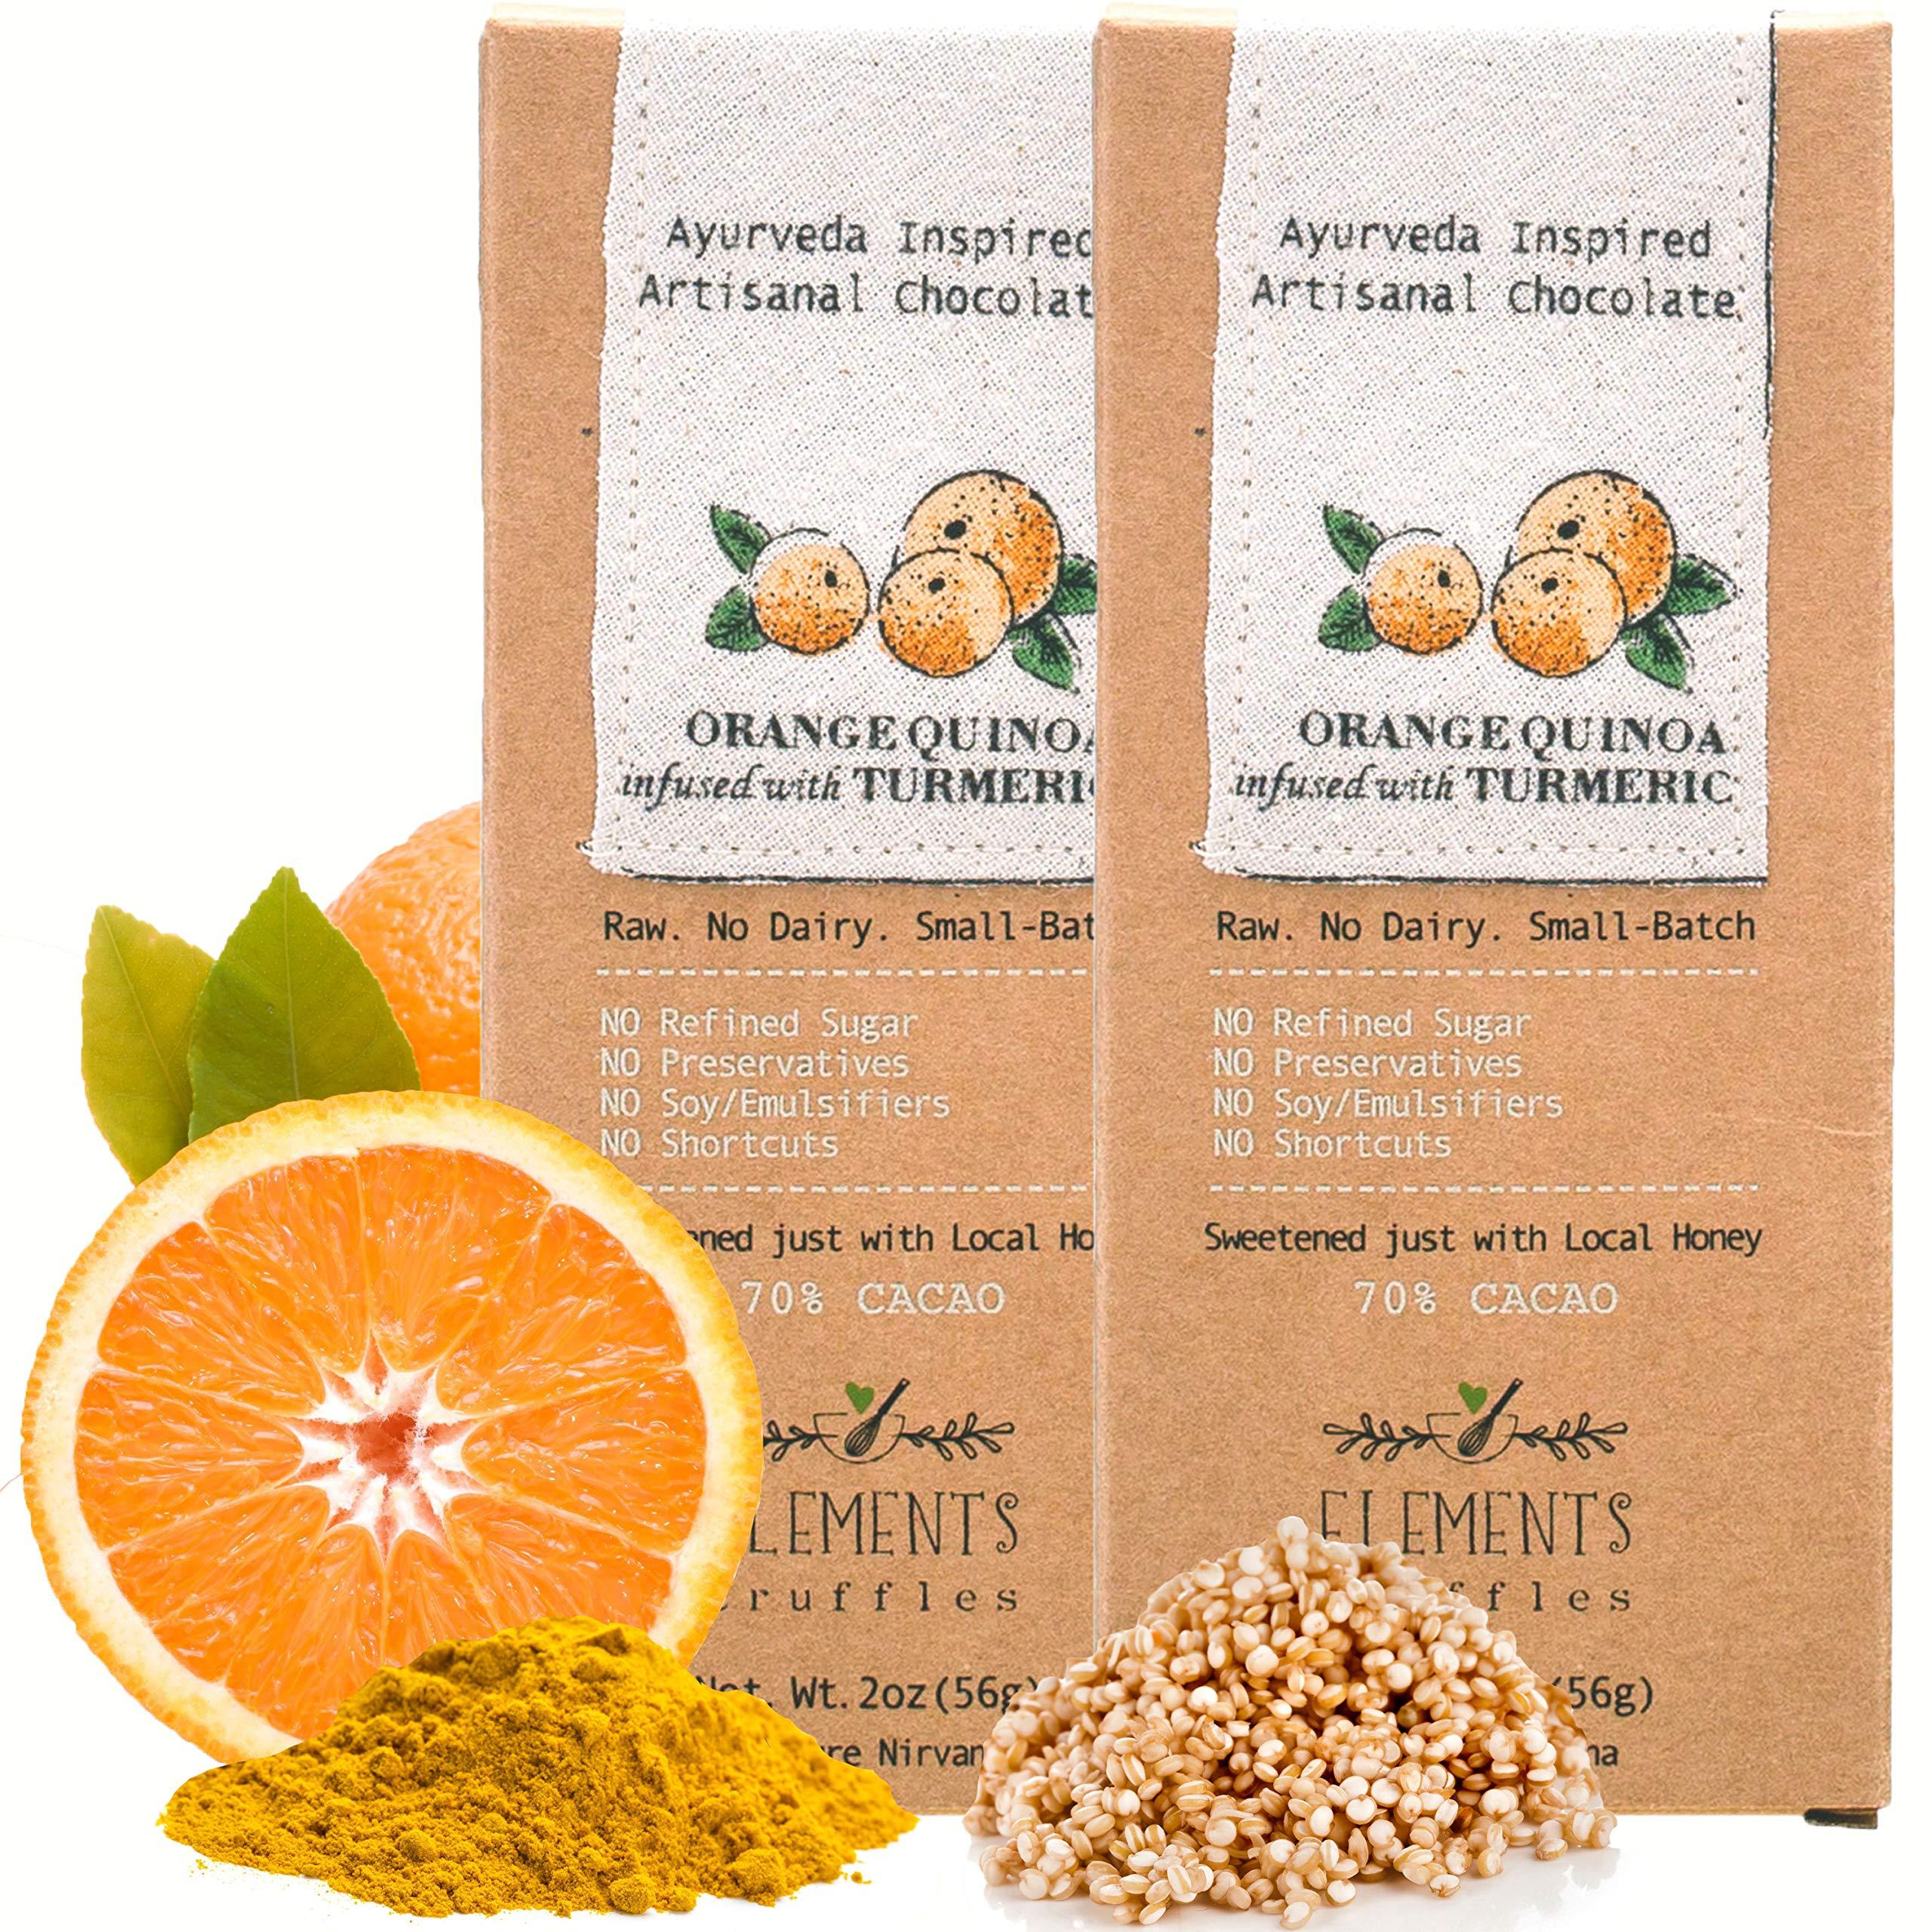 Elements Truffles Orange Quinoa Bar with Turmeric Infusion - Dairy Free Chocolate Bar - Gluten Free